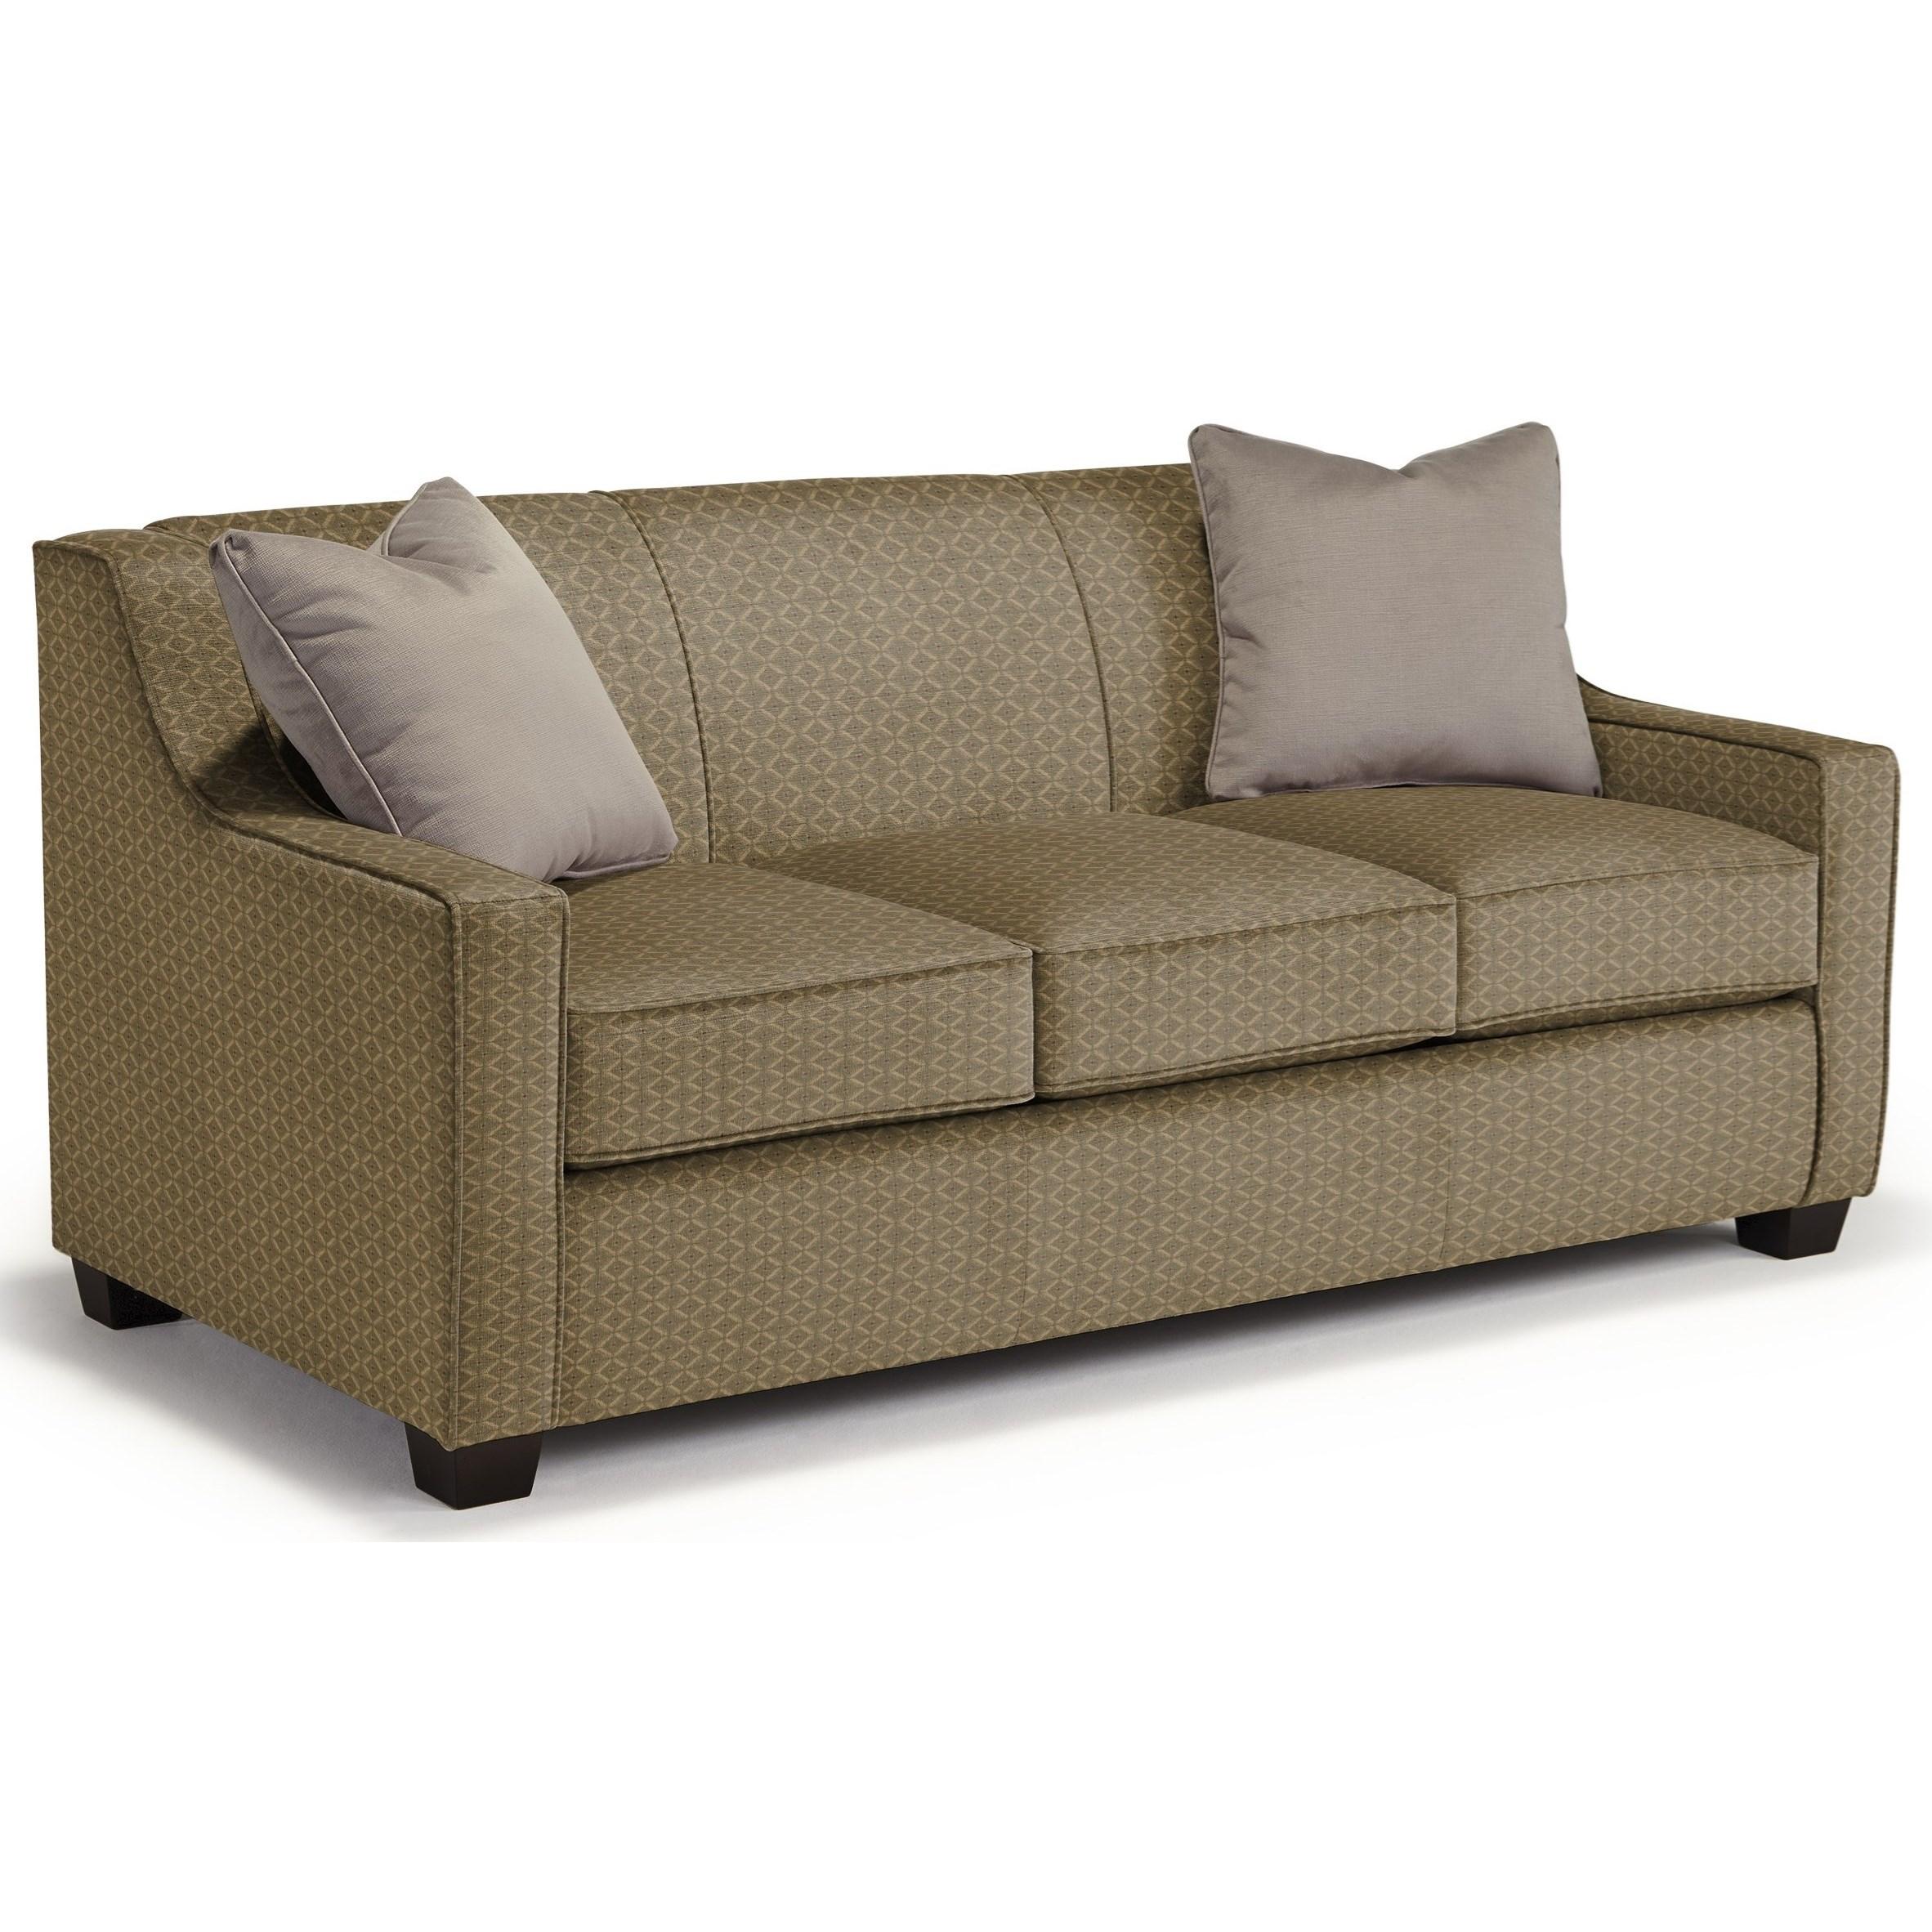 Best Home Furnishings Marinette Full Size Sleeper With